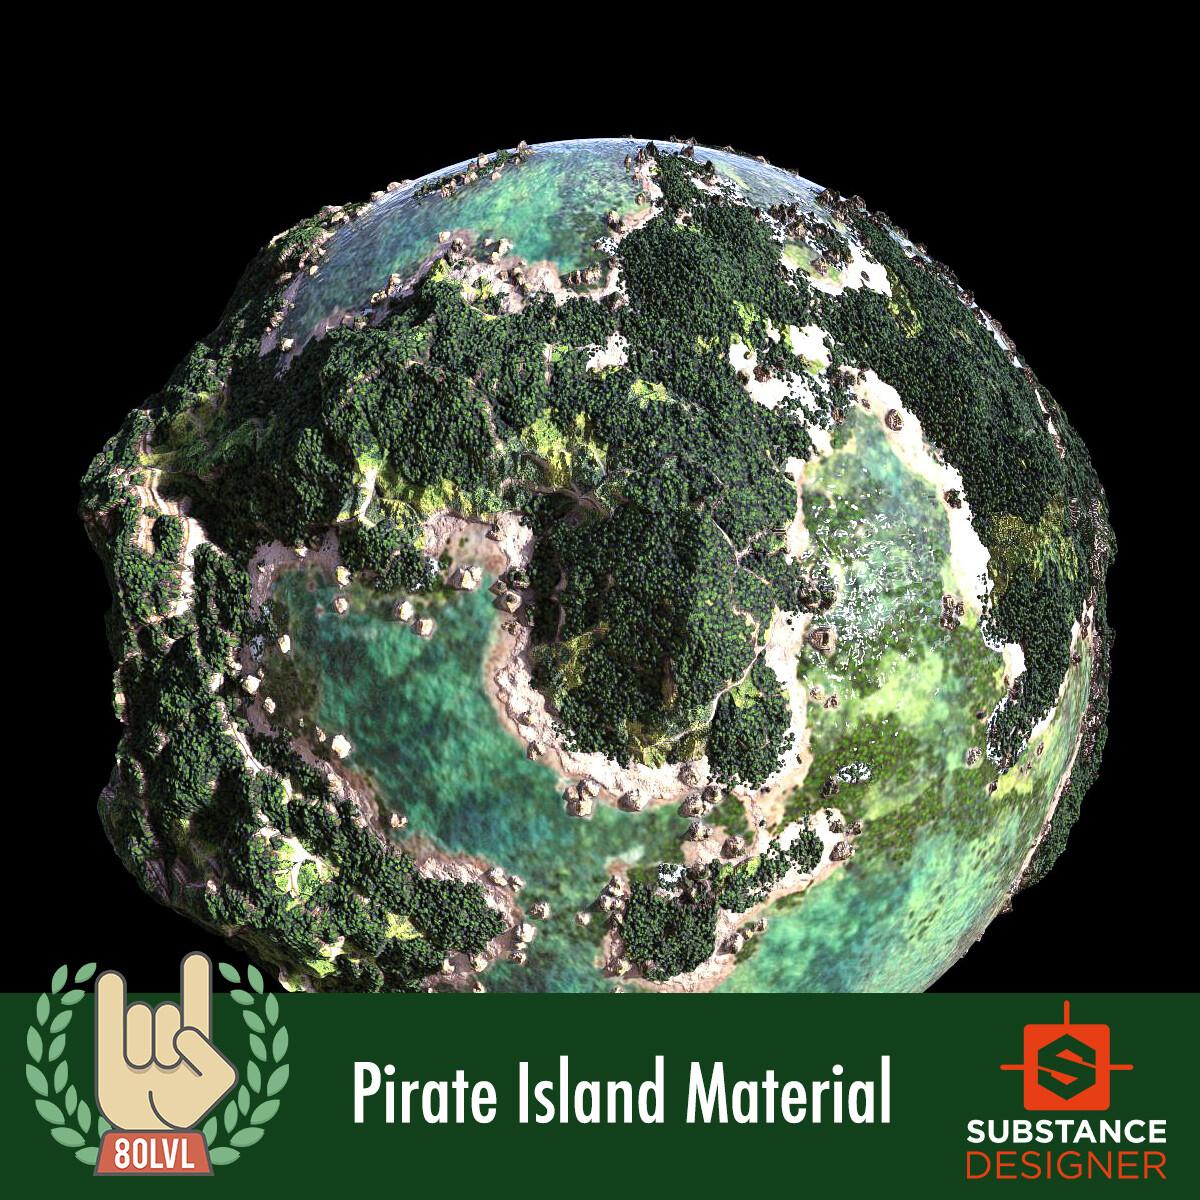 Pirate Island Material - 100% Substance Designer